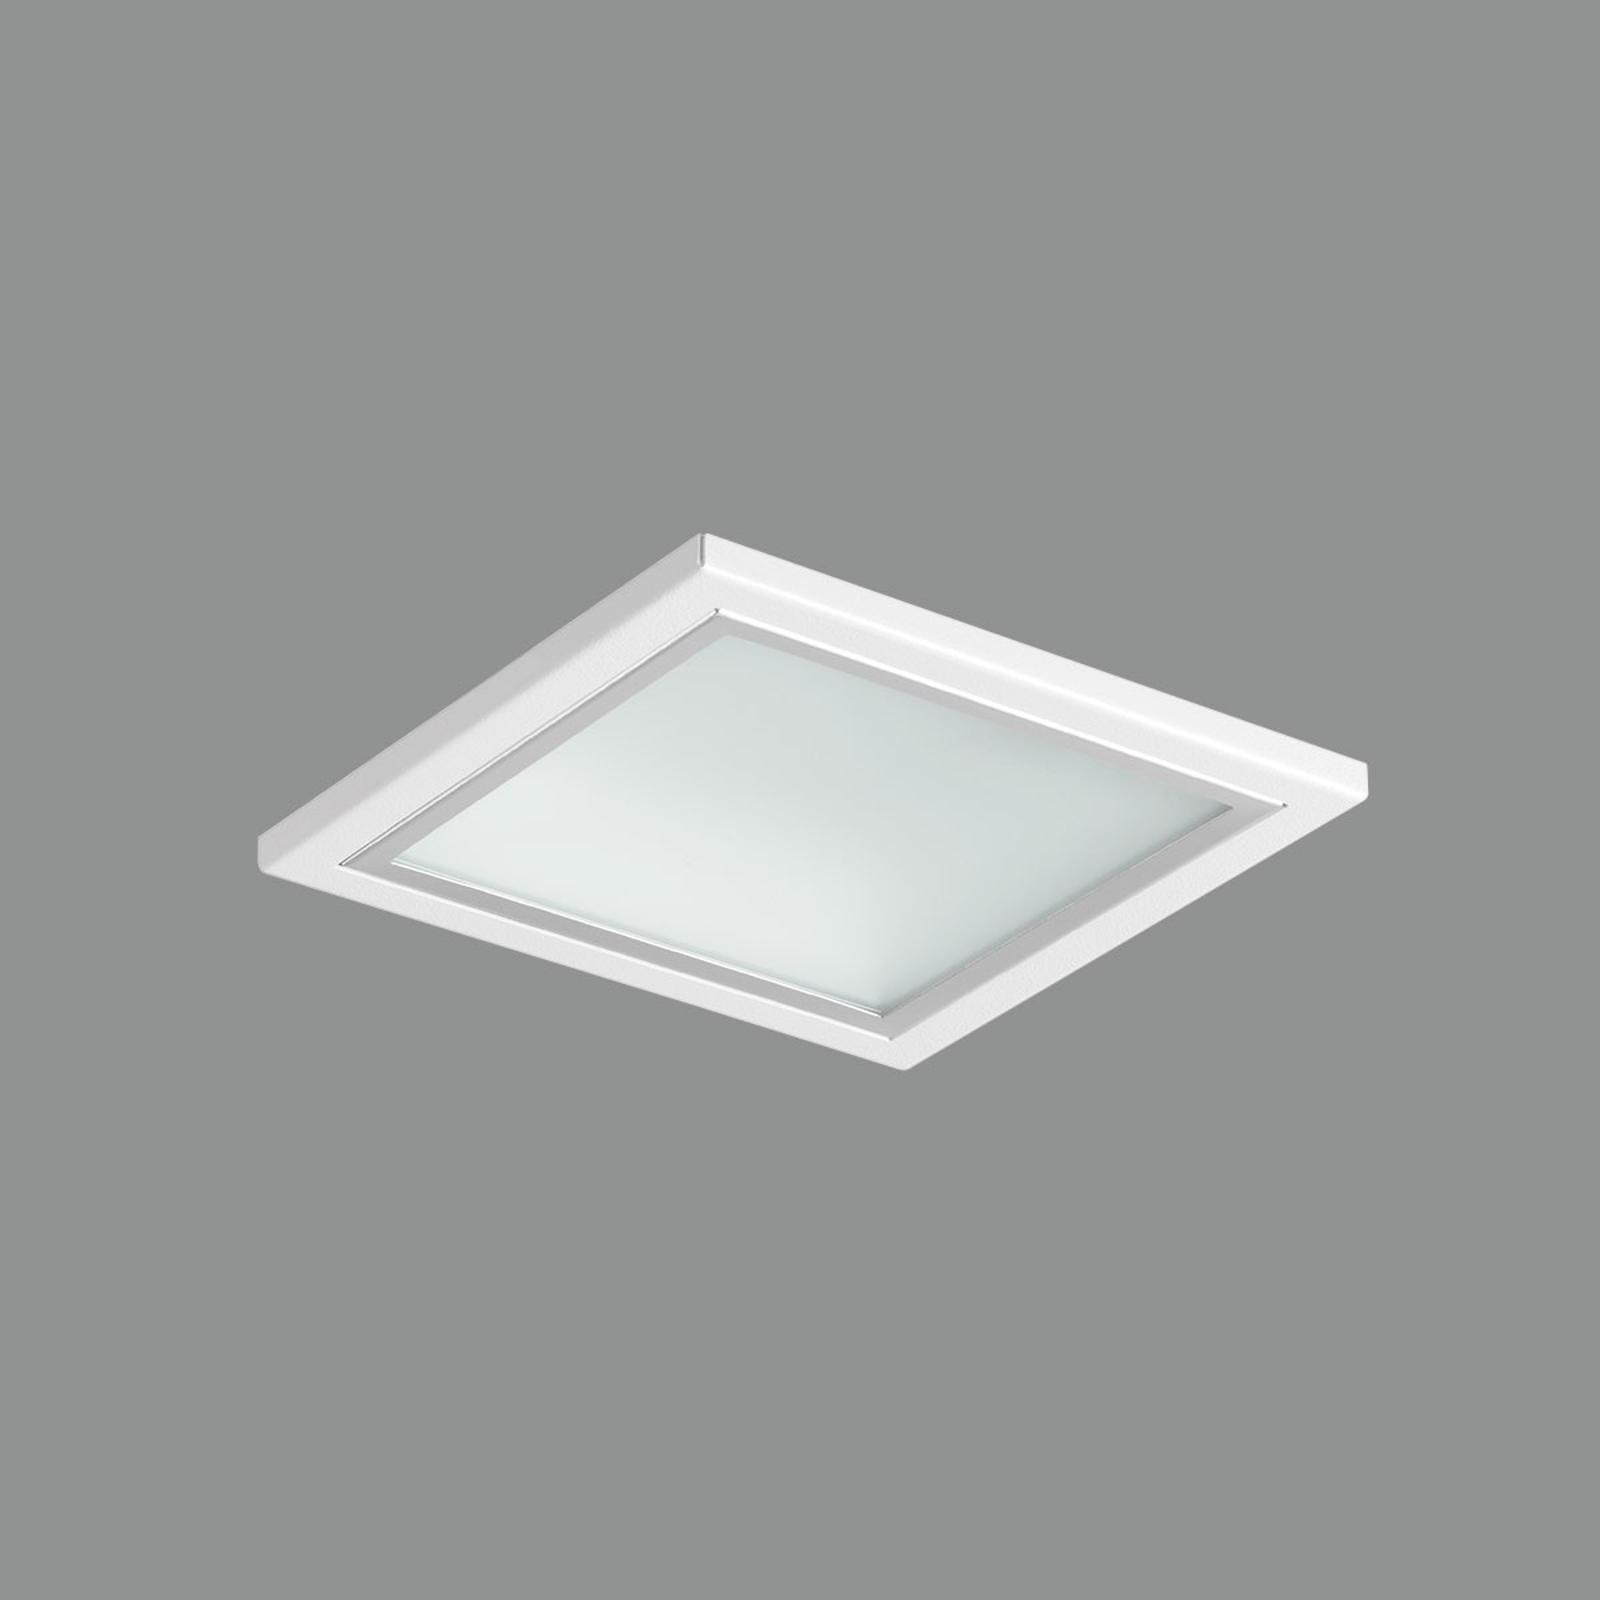 Downlight LED Noviel S PRO, 20 W, 79°, 3000K